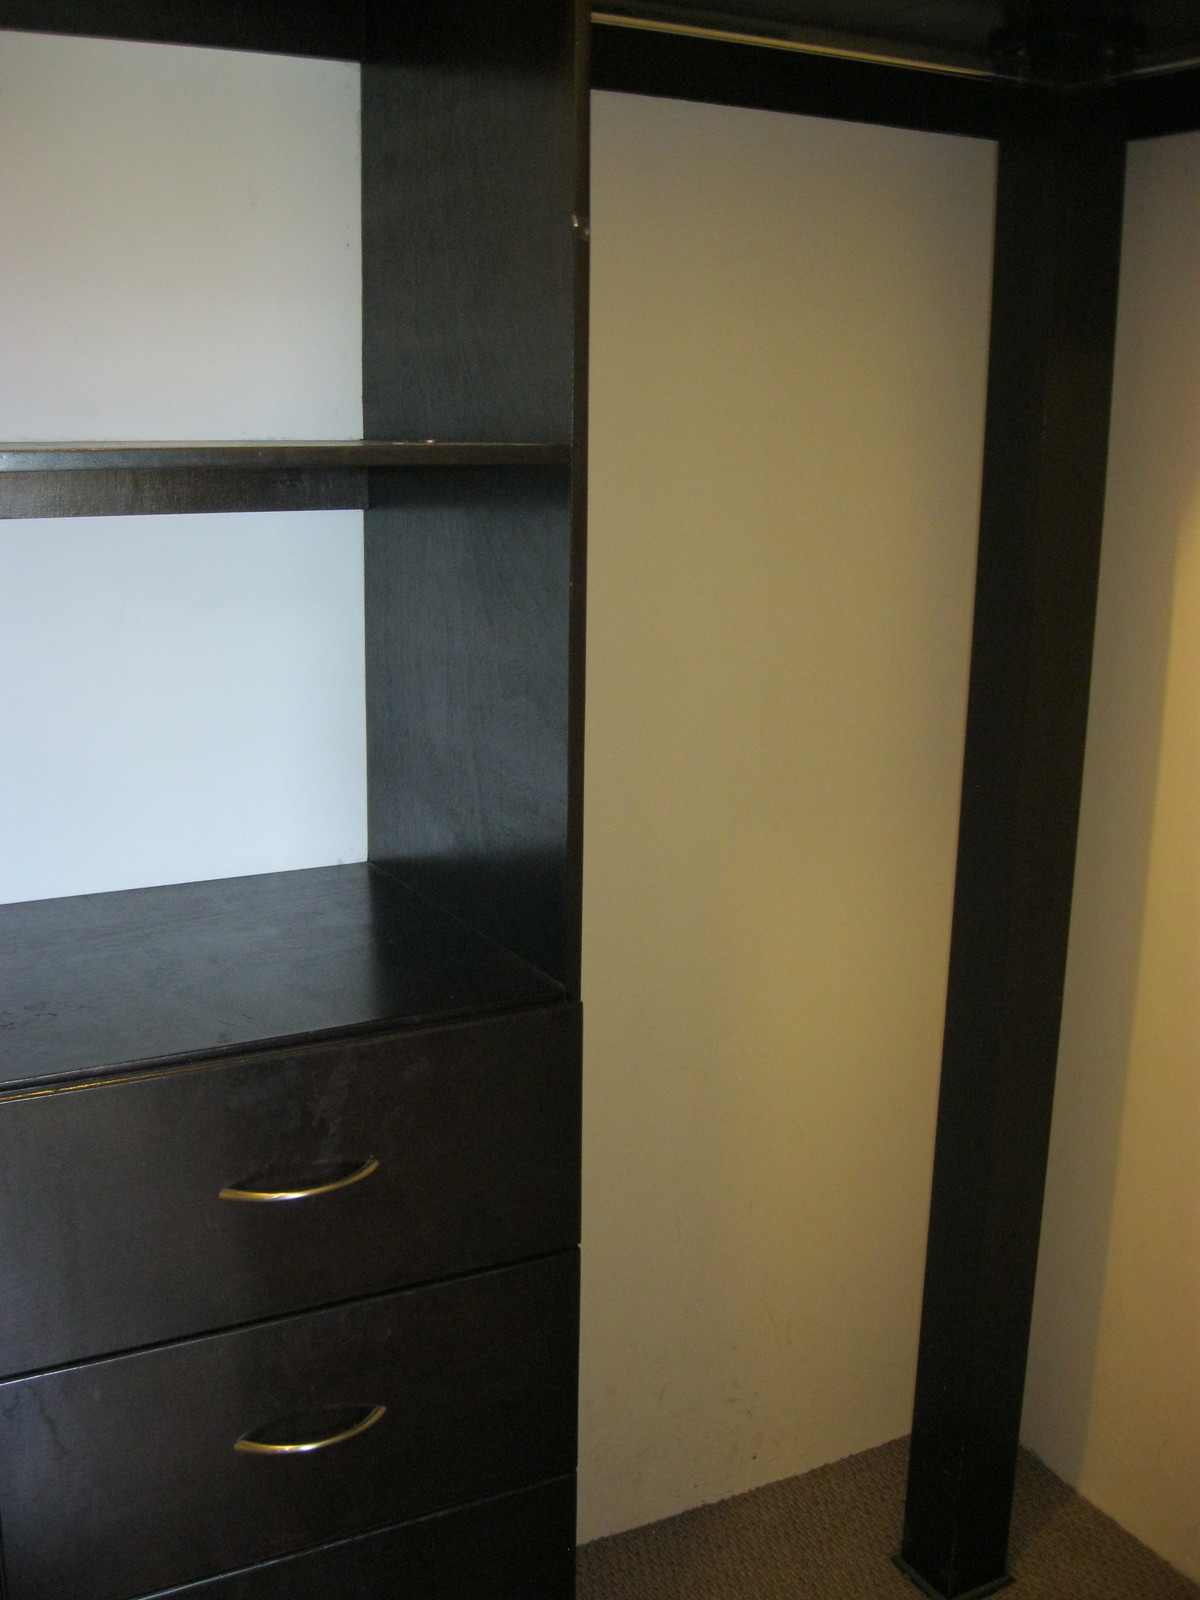 34 de 43: Walkin closet